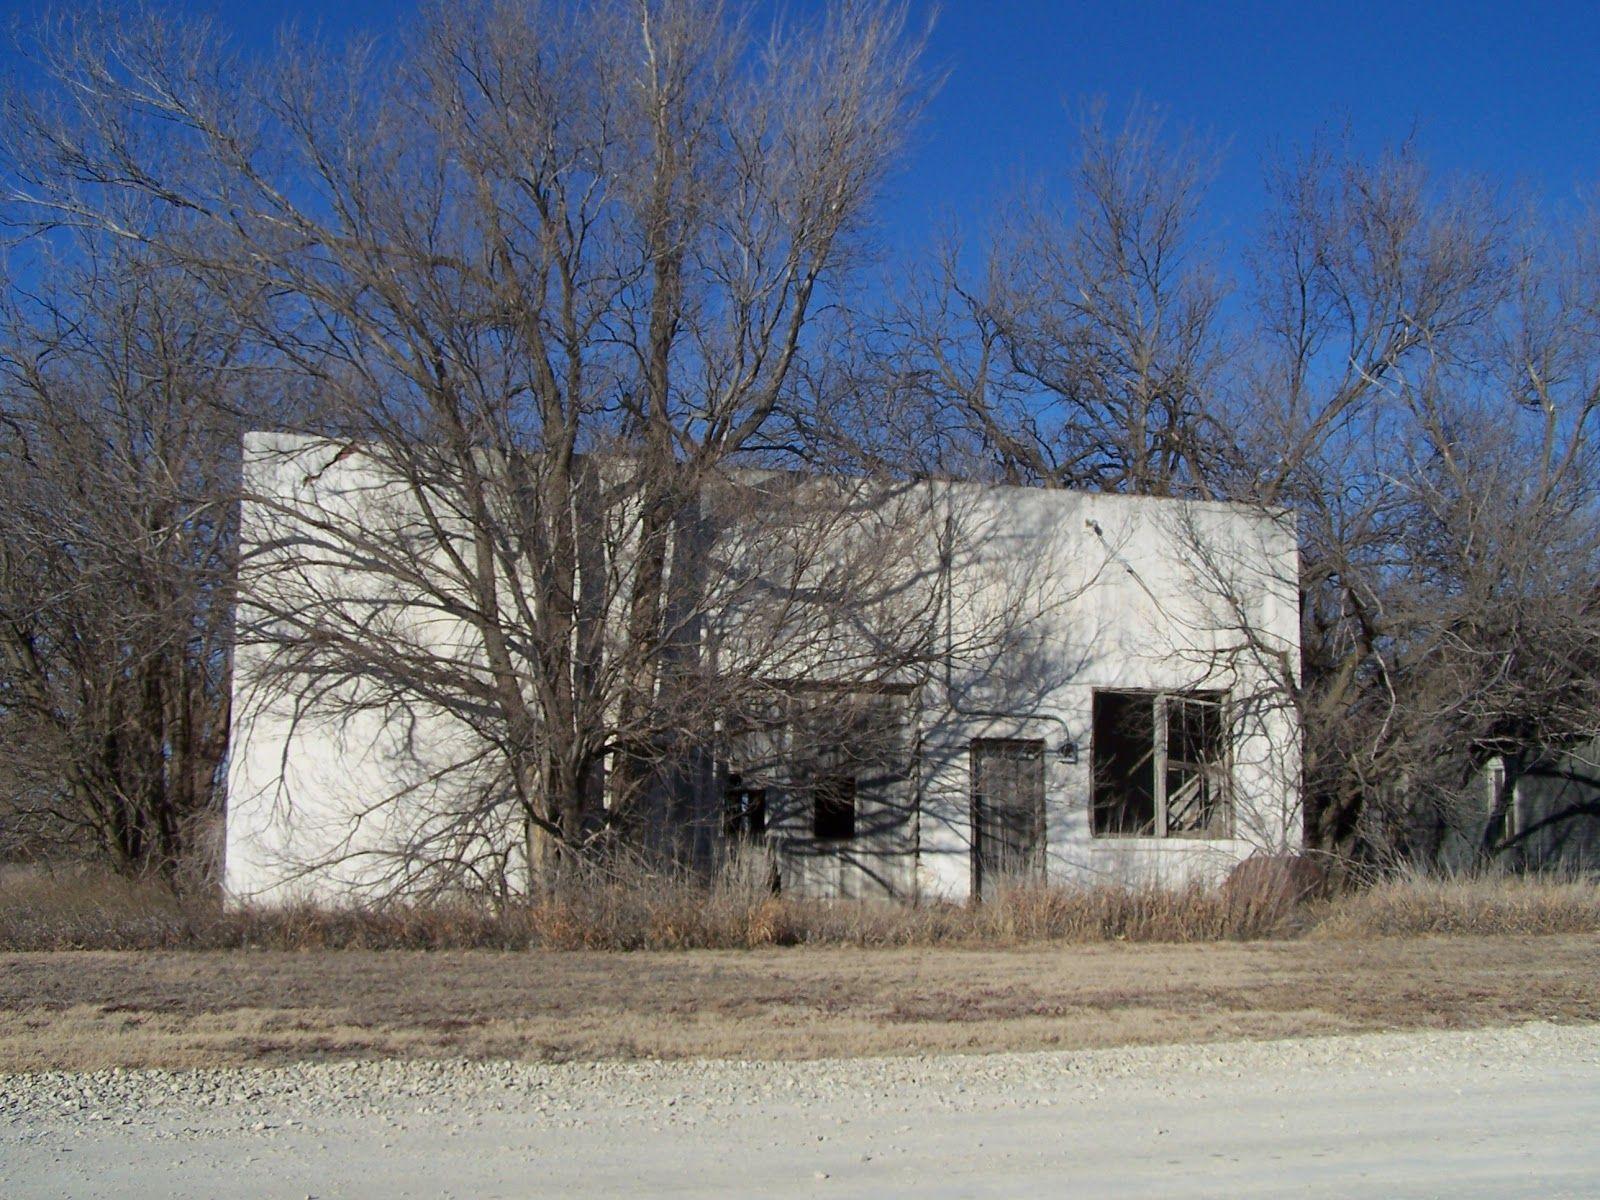 Kansas morris county dwight - Kansas Towns Photos Dead Towns Of Kansas Elmo Kansas A Dickinson County